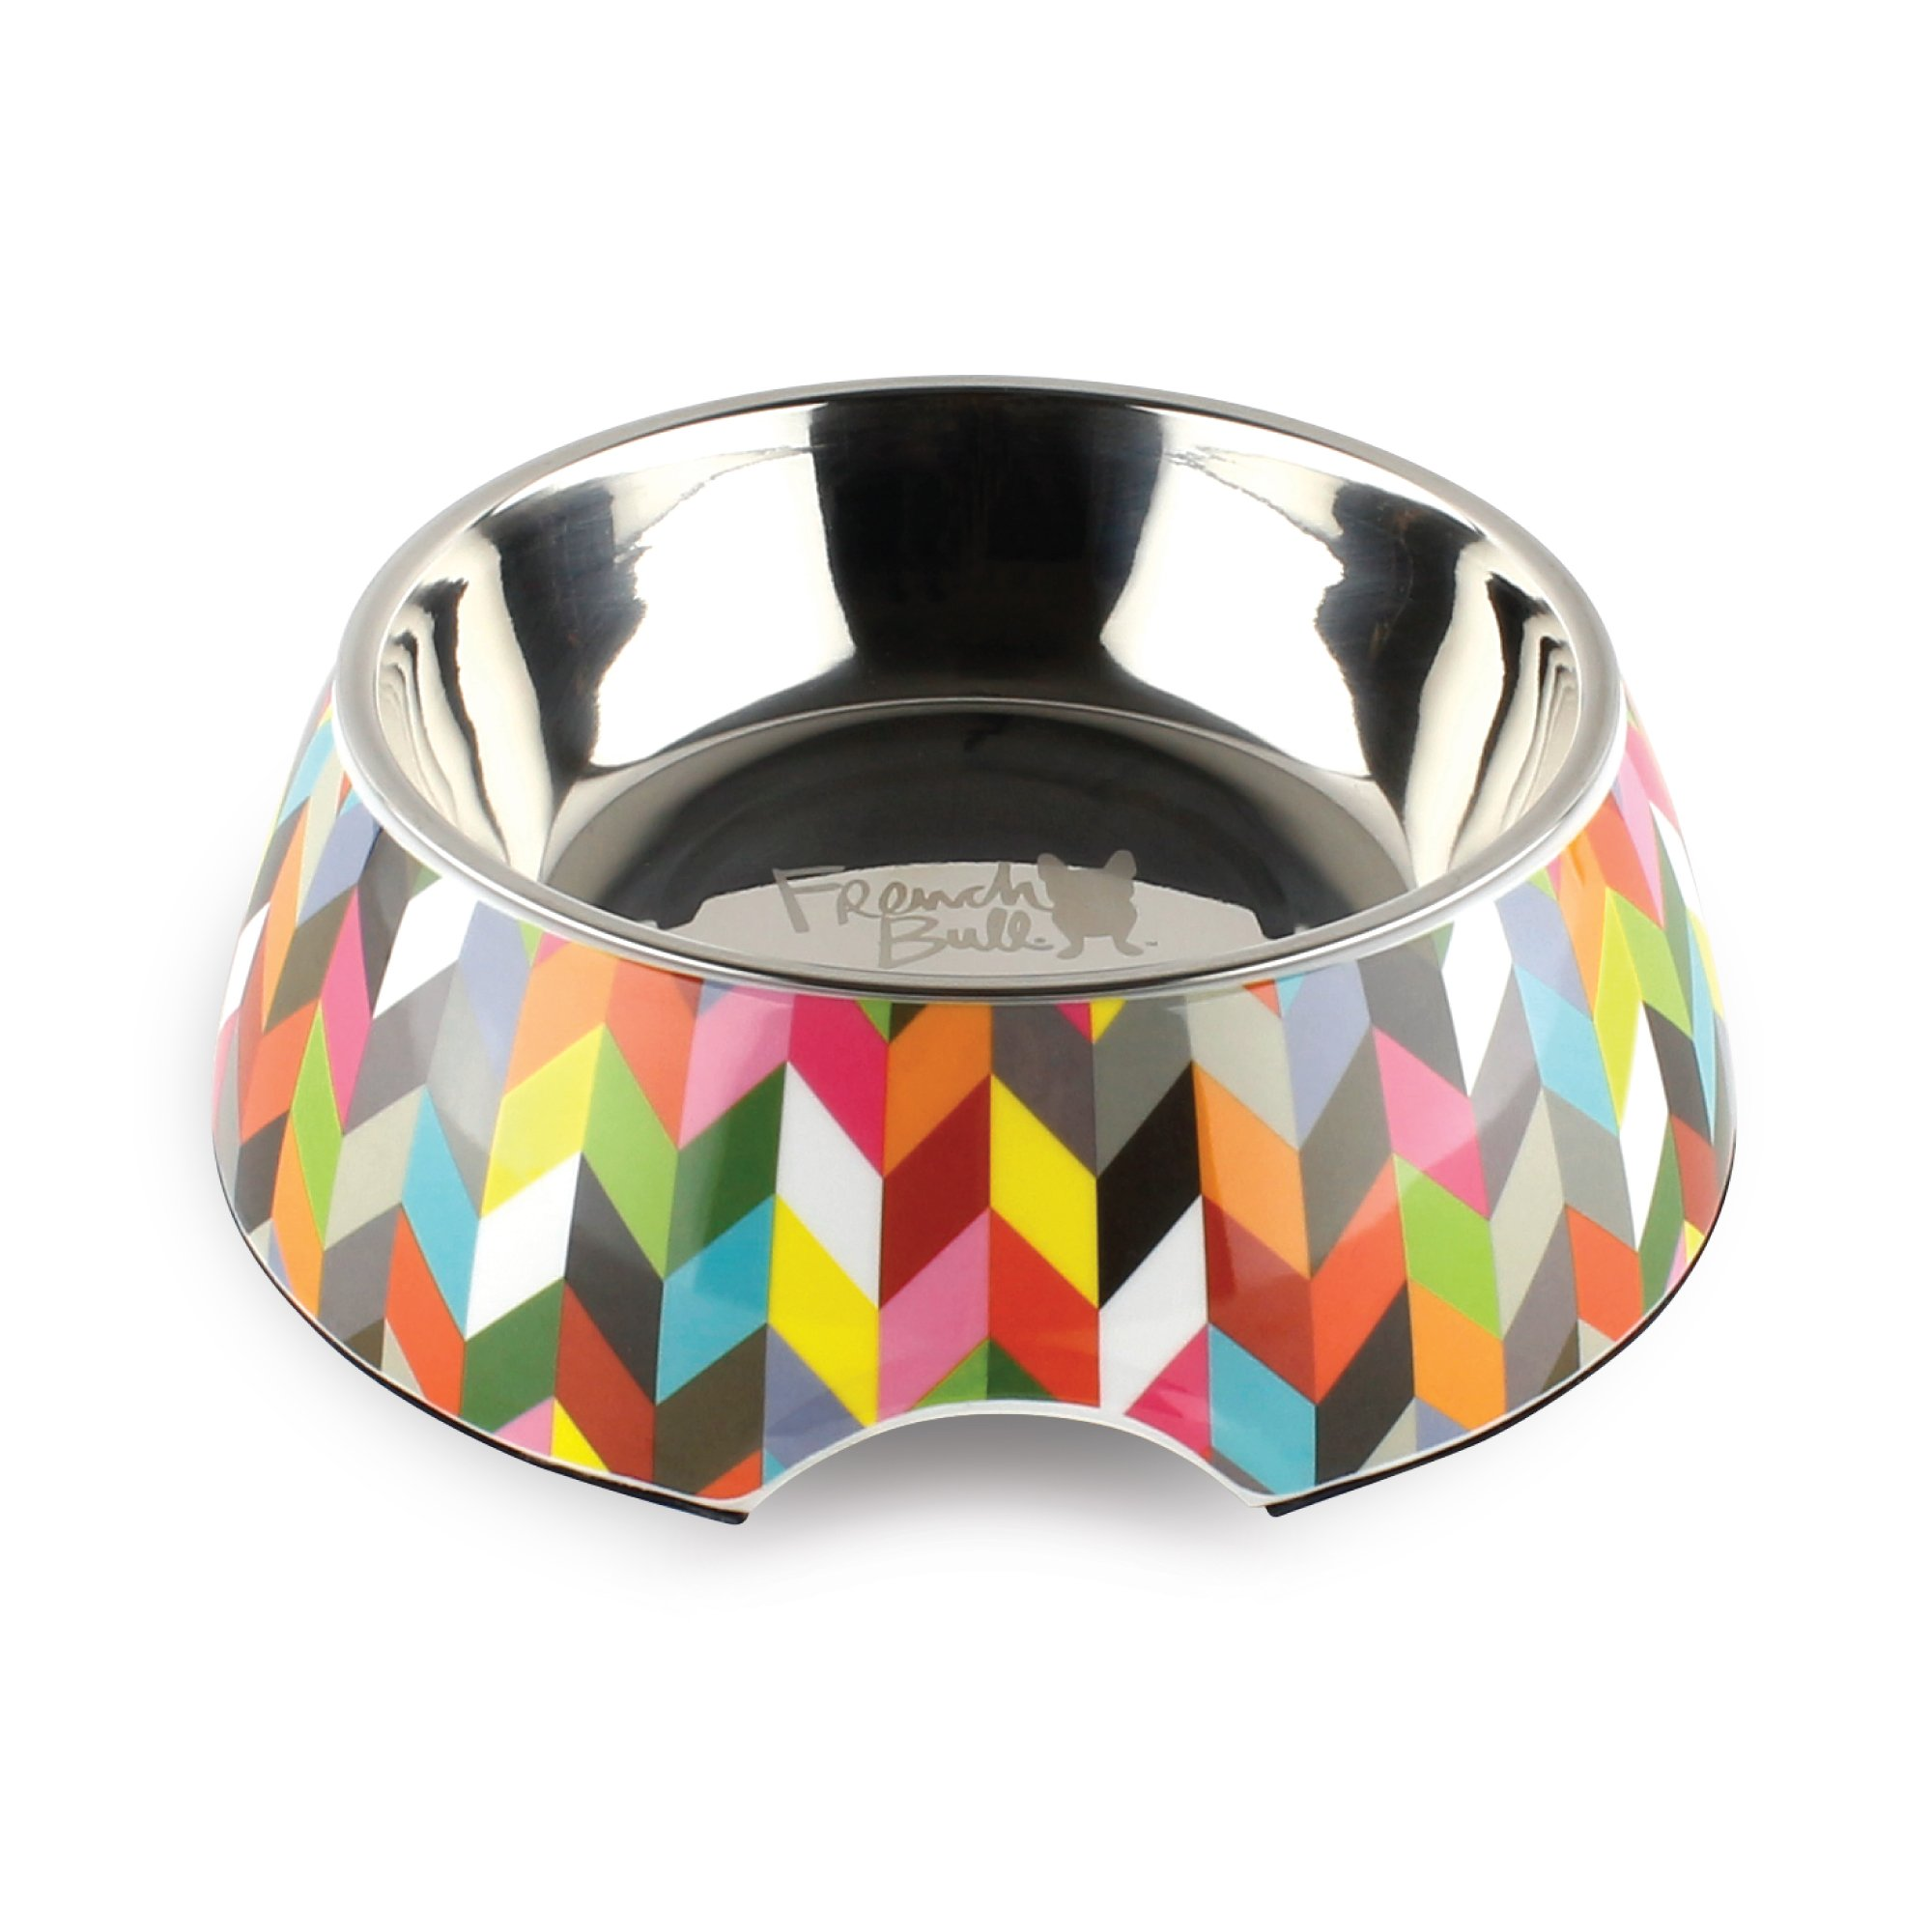 French Bull 12 oz. Pet Bowl, 2 Piece - Dog, Cat, Feeder, Nonslip, Stainless Steel, Raised - Ziggy